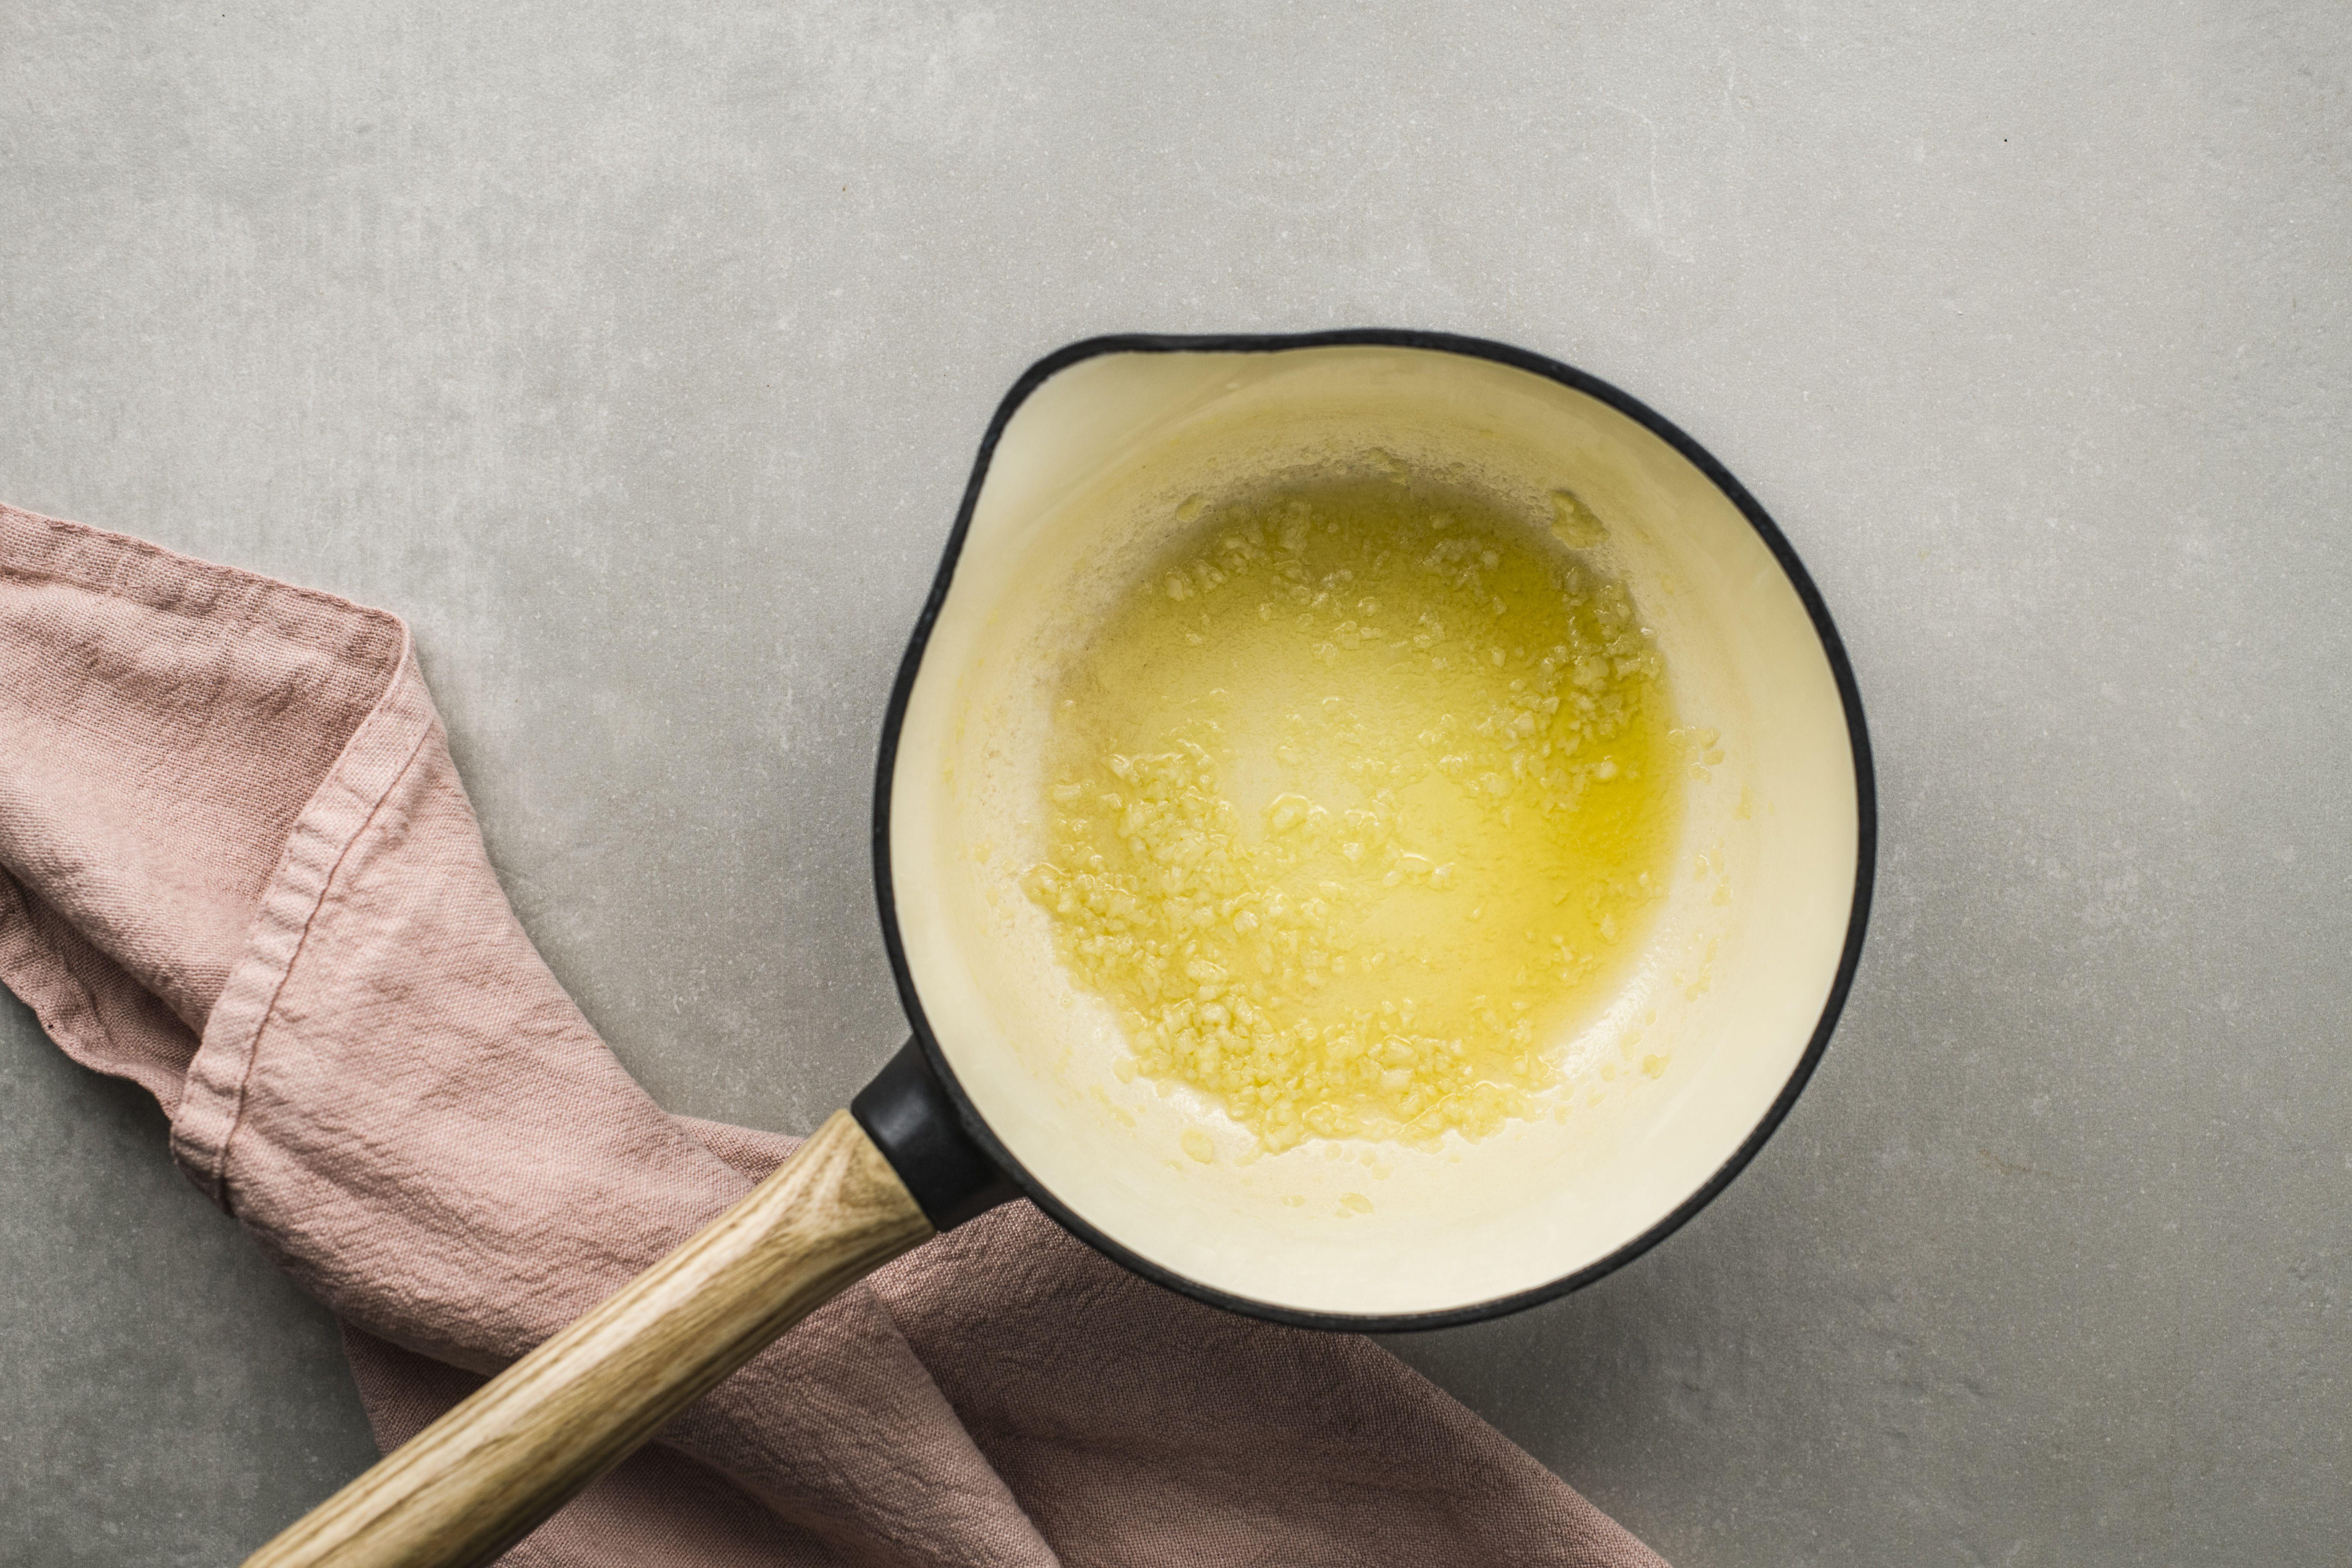 Foaming butter and garlic in a saucepan